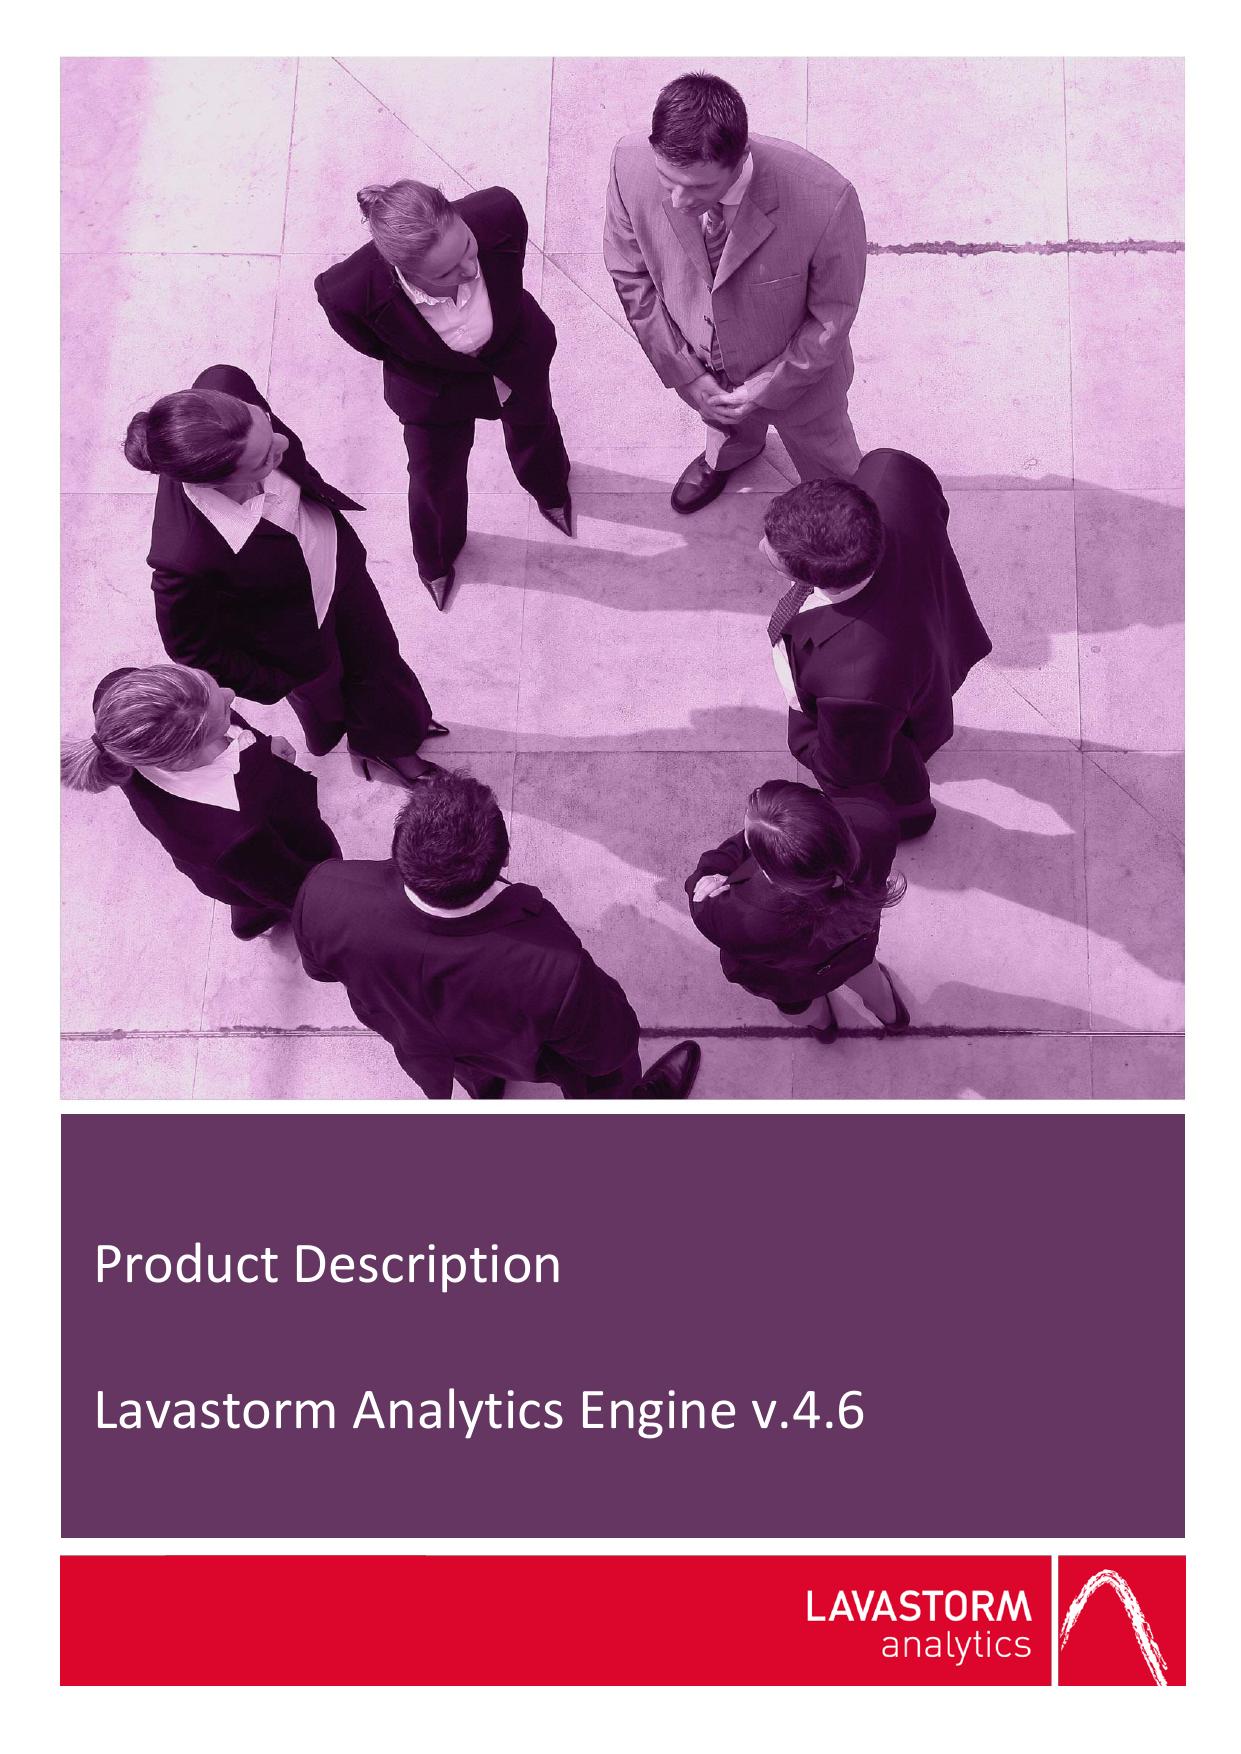 Lavastorm Analytics Product Description | manualzz com